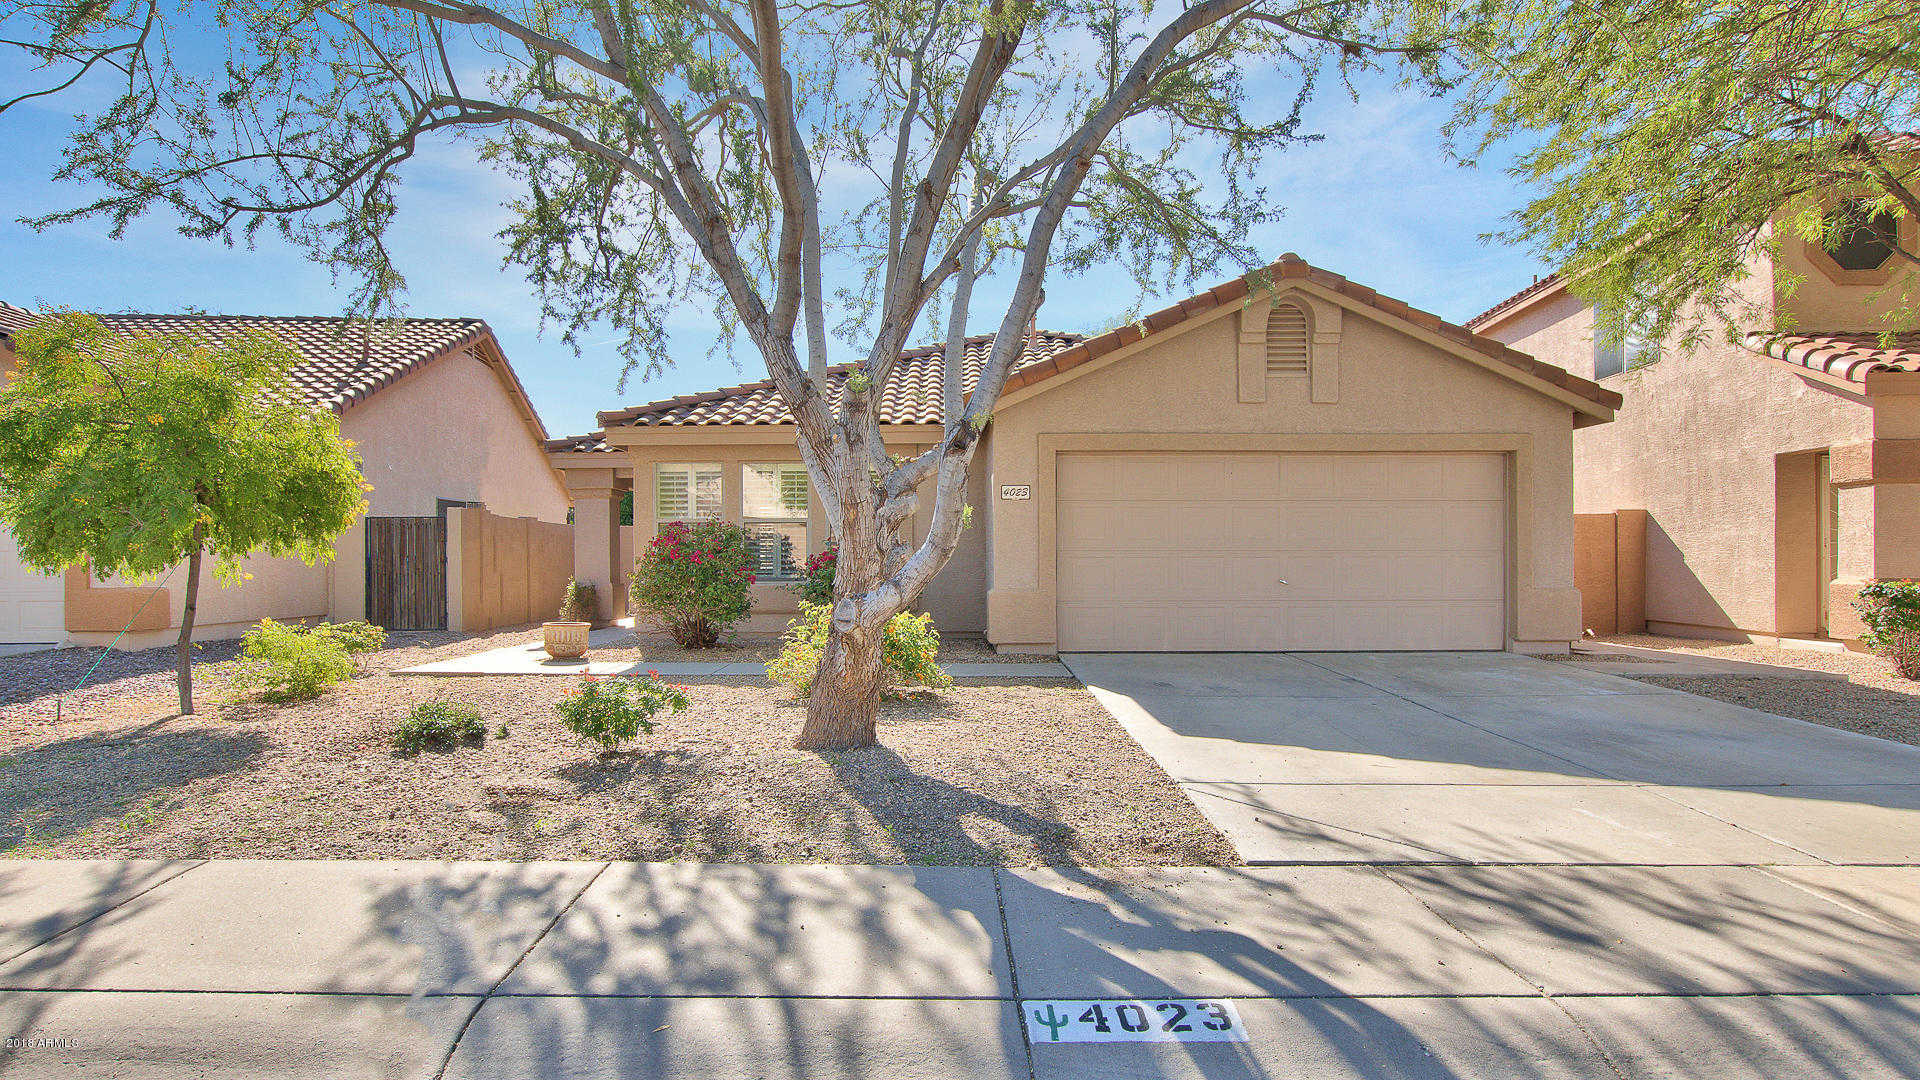 $359,000 - 4Br/2Ba - Home for Sale in Tatum Highlands Parcel 21, Phoenix